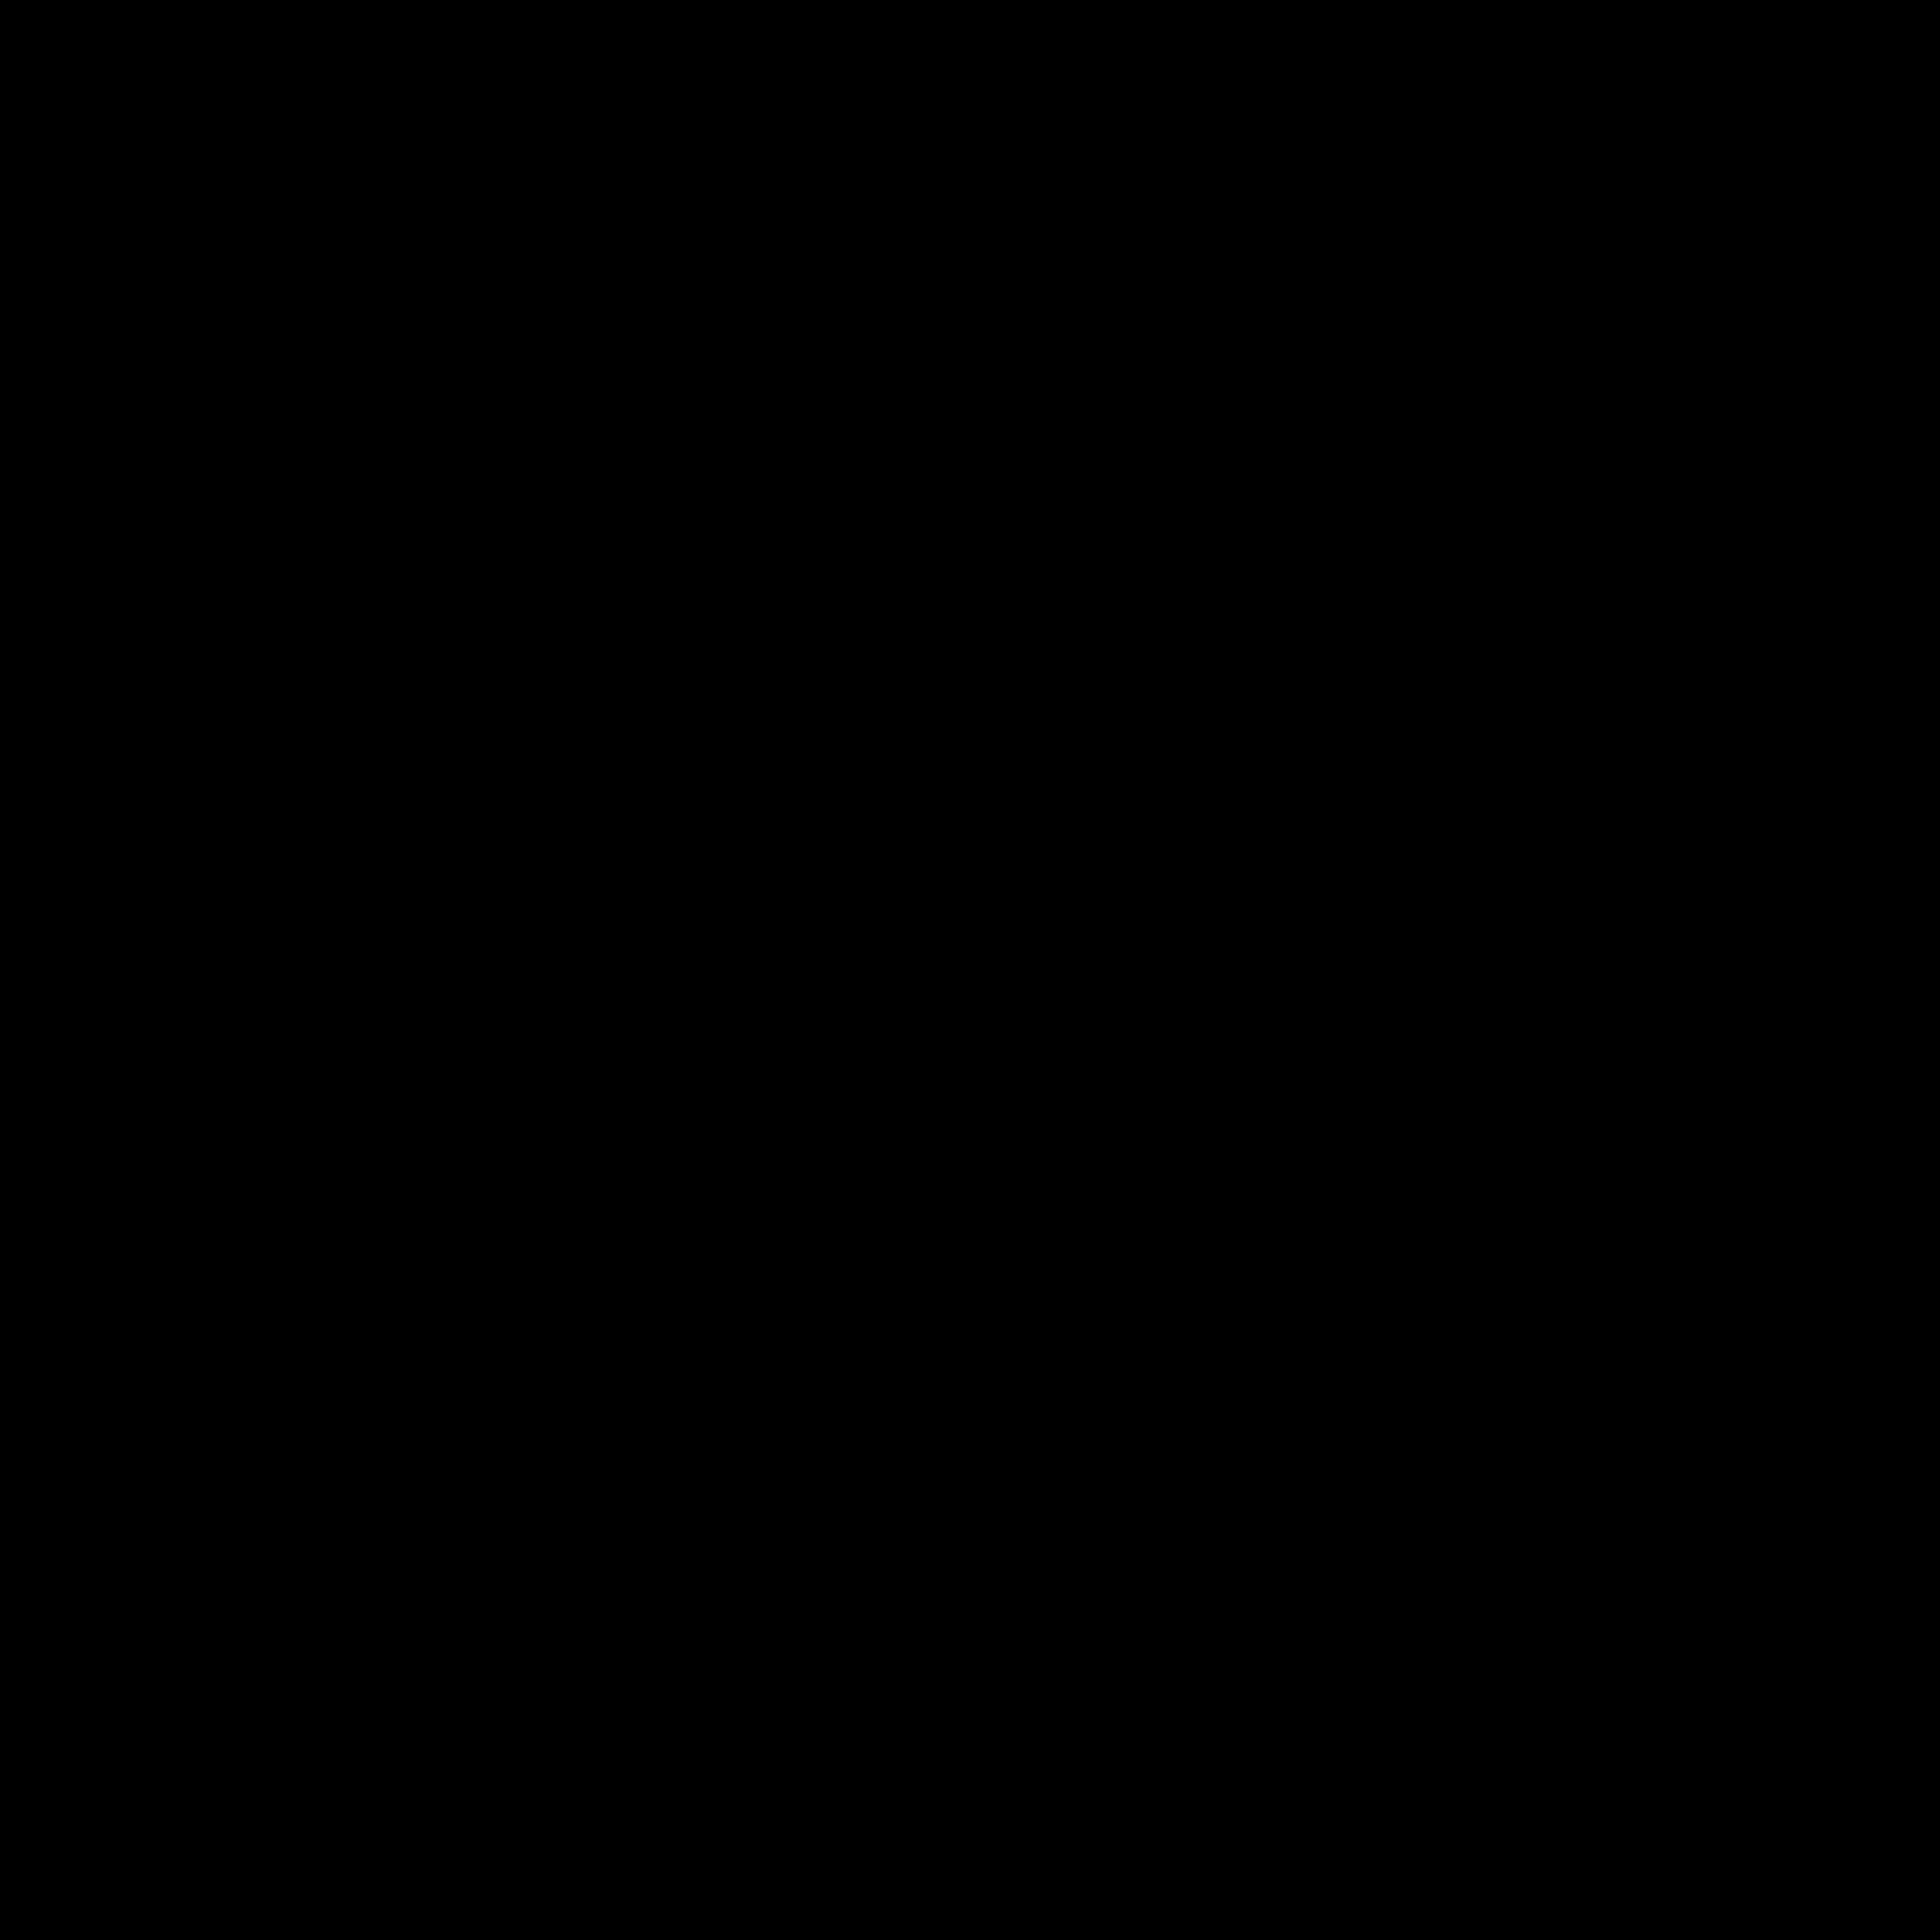 Clairol 1208 Logo PNG Transparent & SVG Vector.